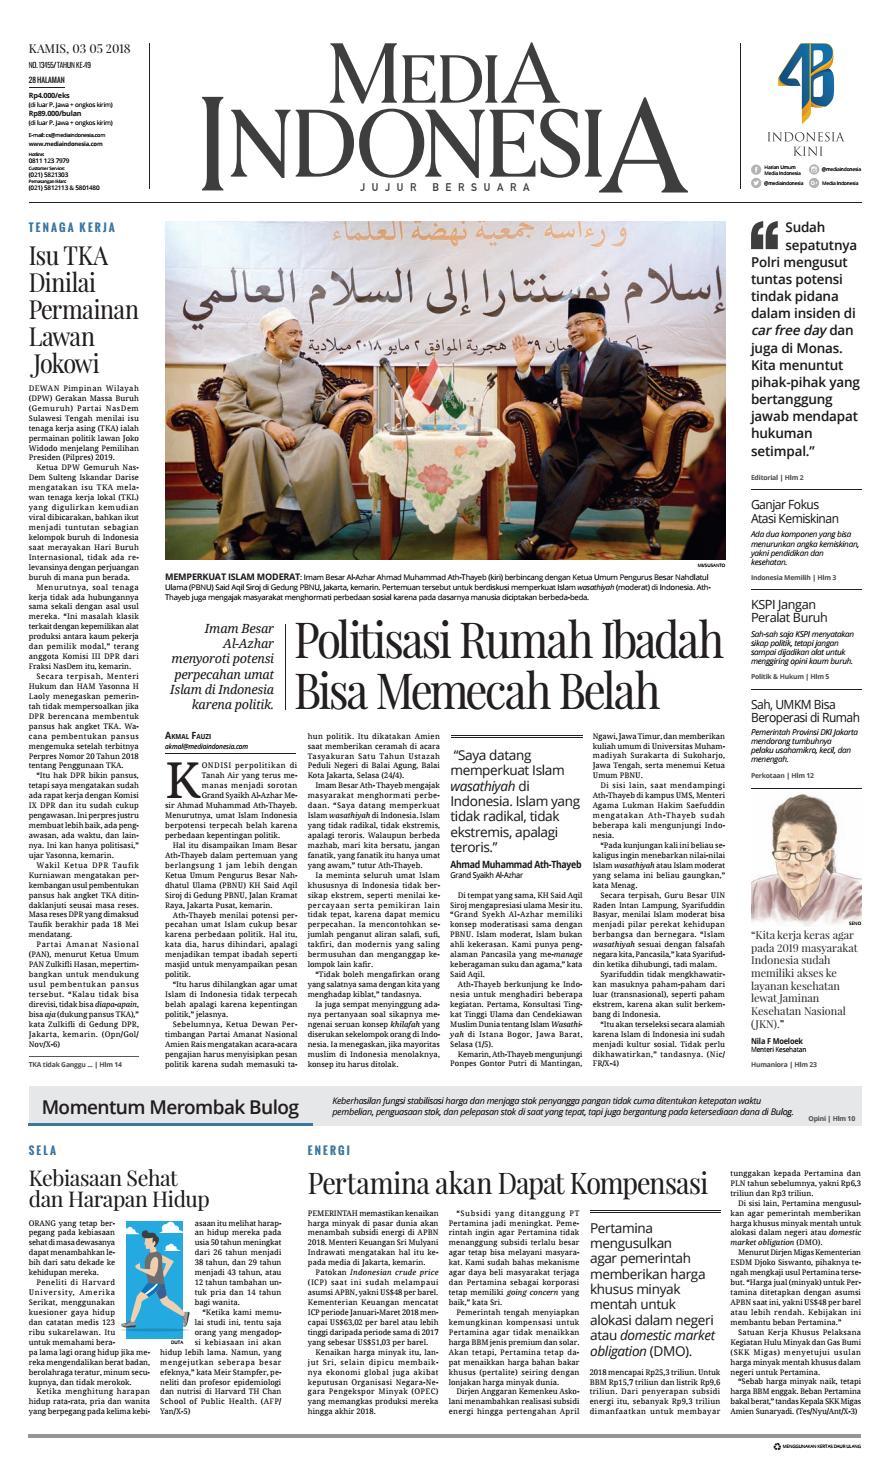 Mediaindonesia 03 05 2018 03052018133219 By Oppah Issuu